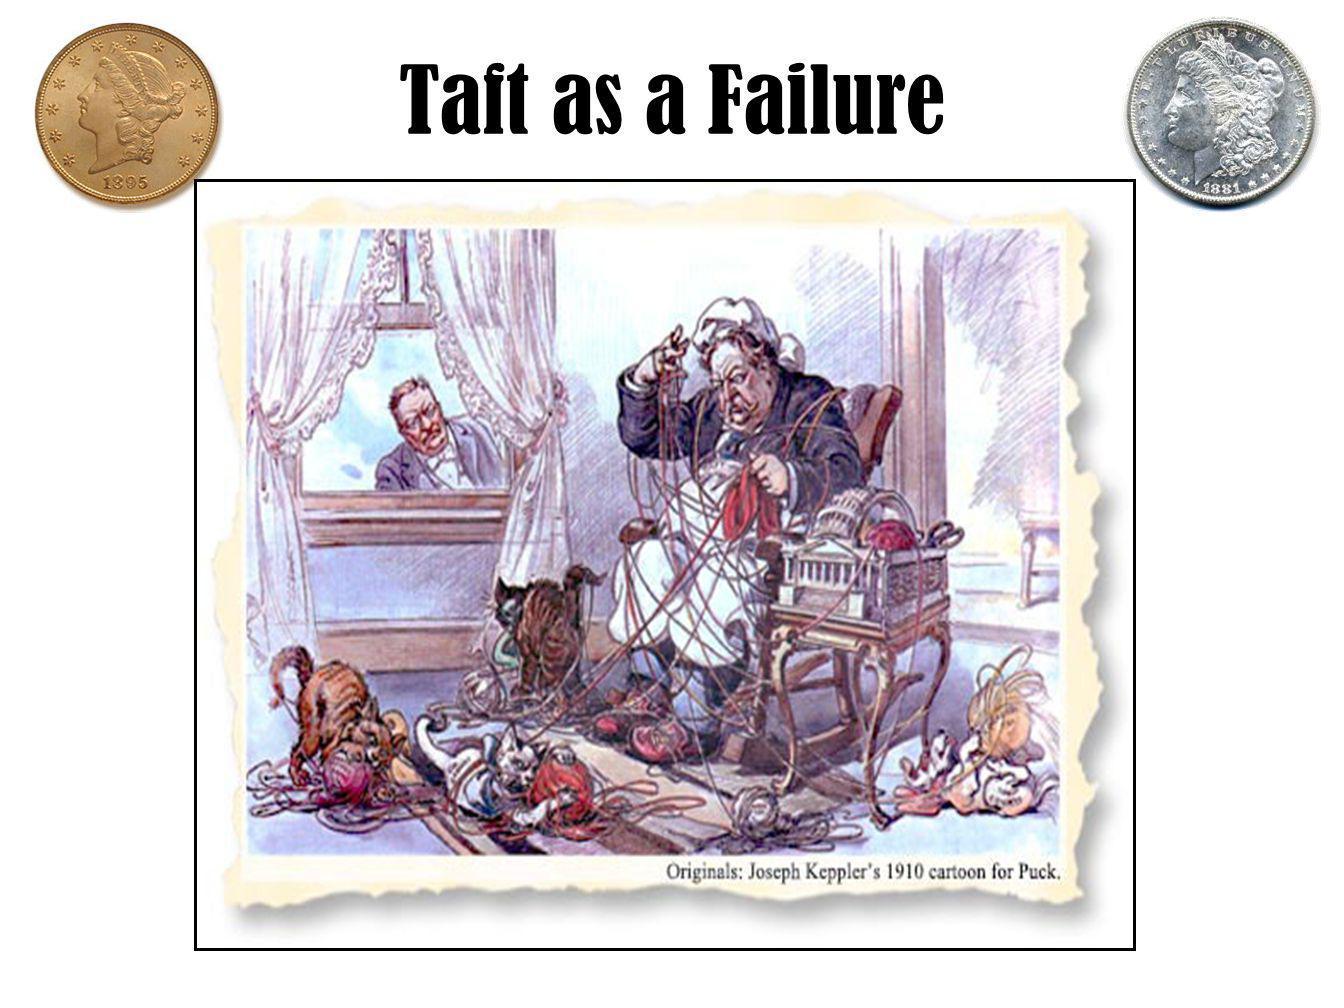 Taft as a Failure